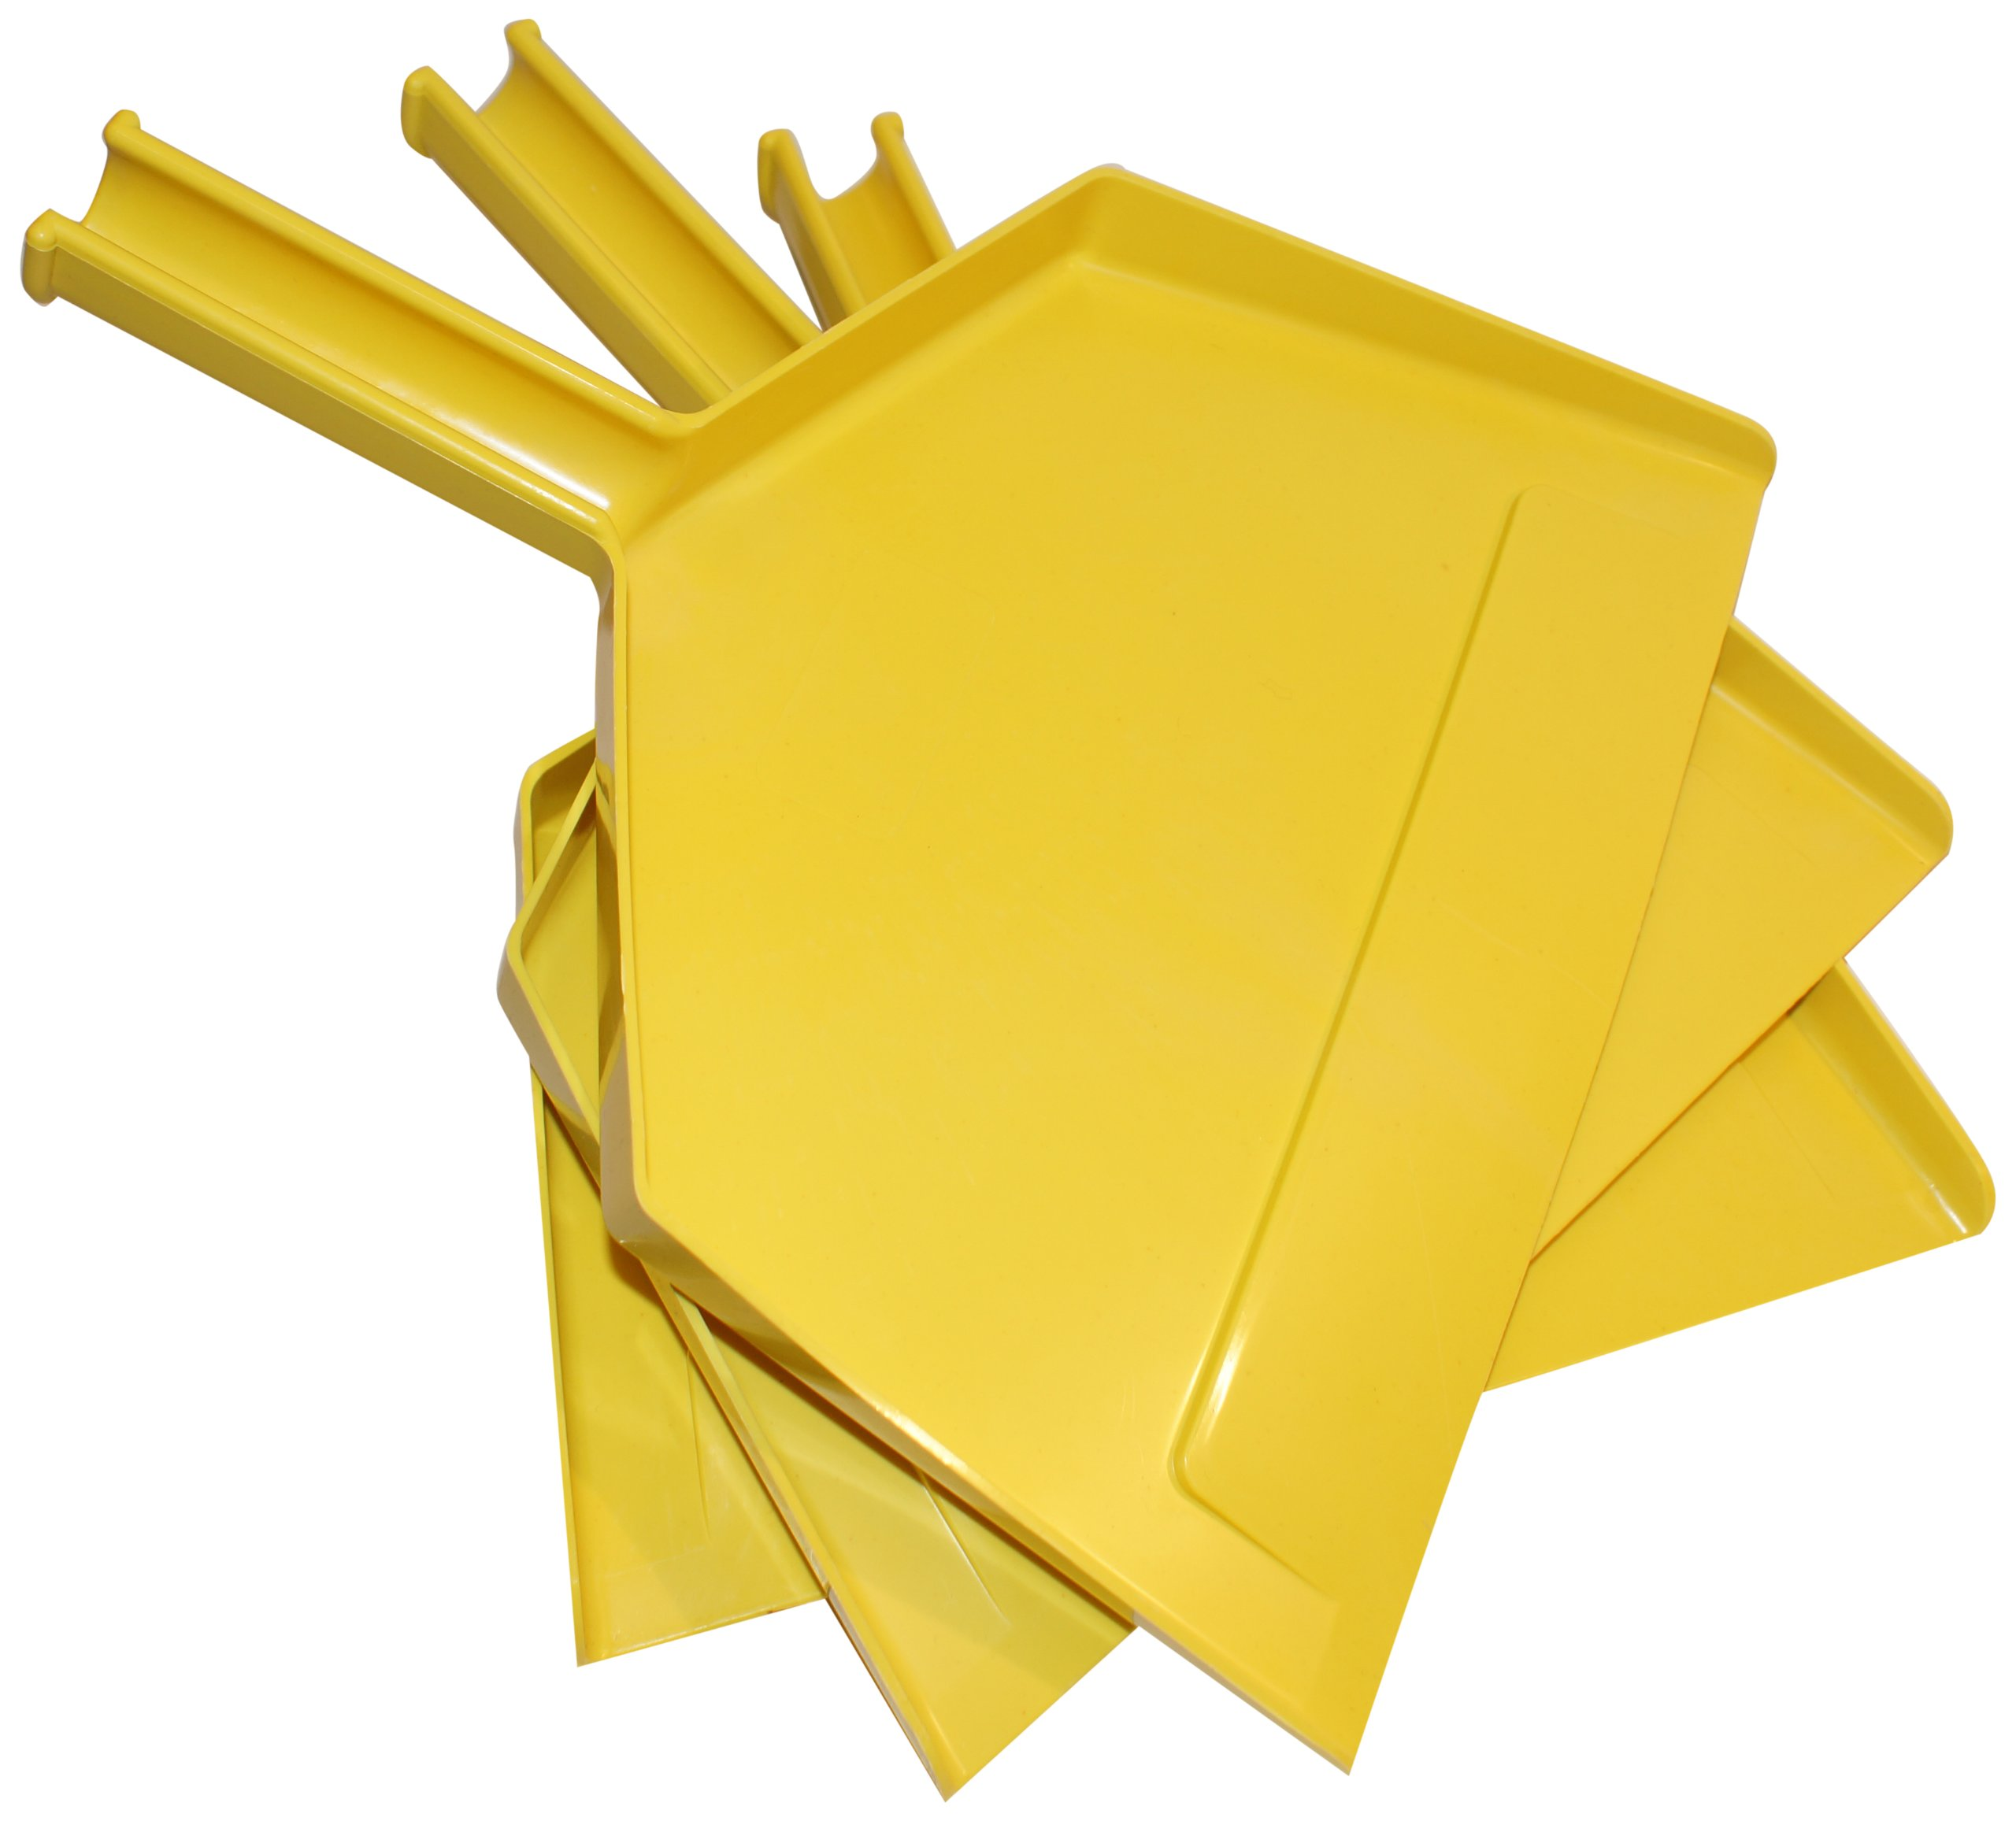 Smart BroomYT-3CDPY Clip-On Dust Pan, 3-Pack (6 packs of 3)